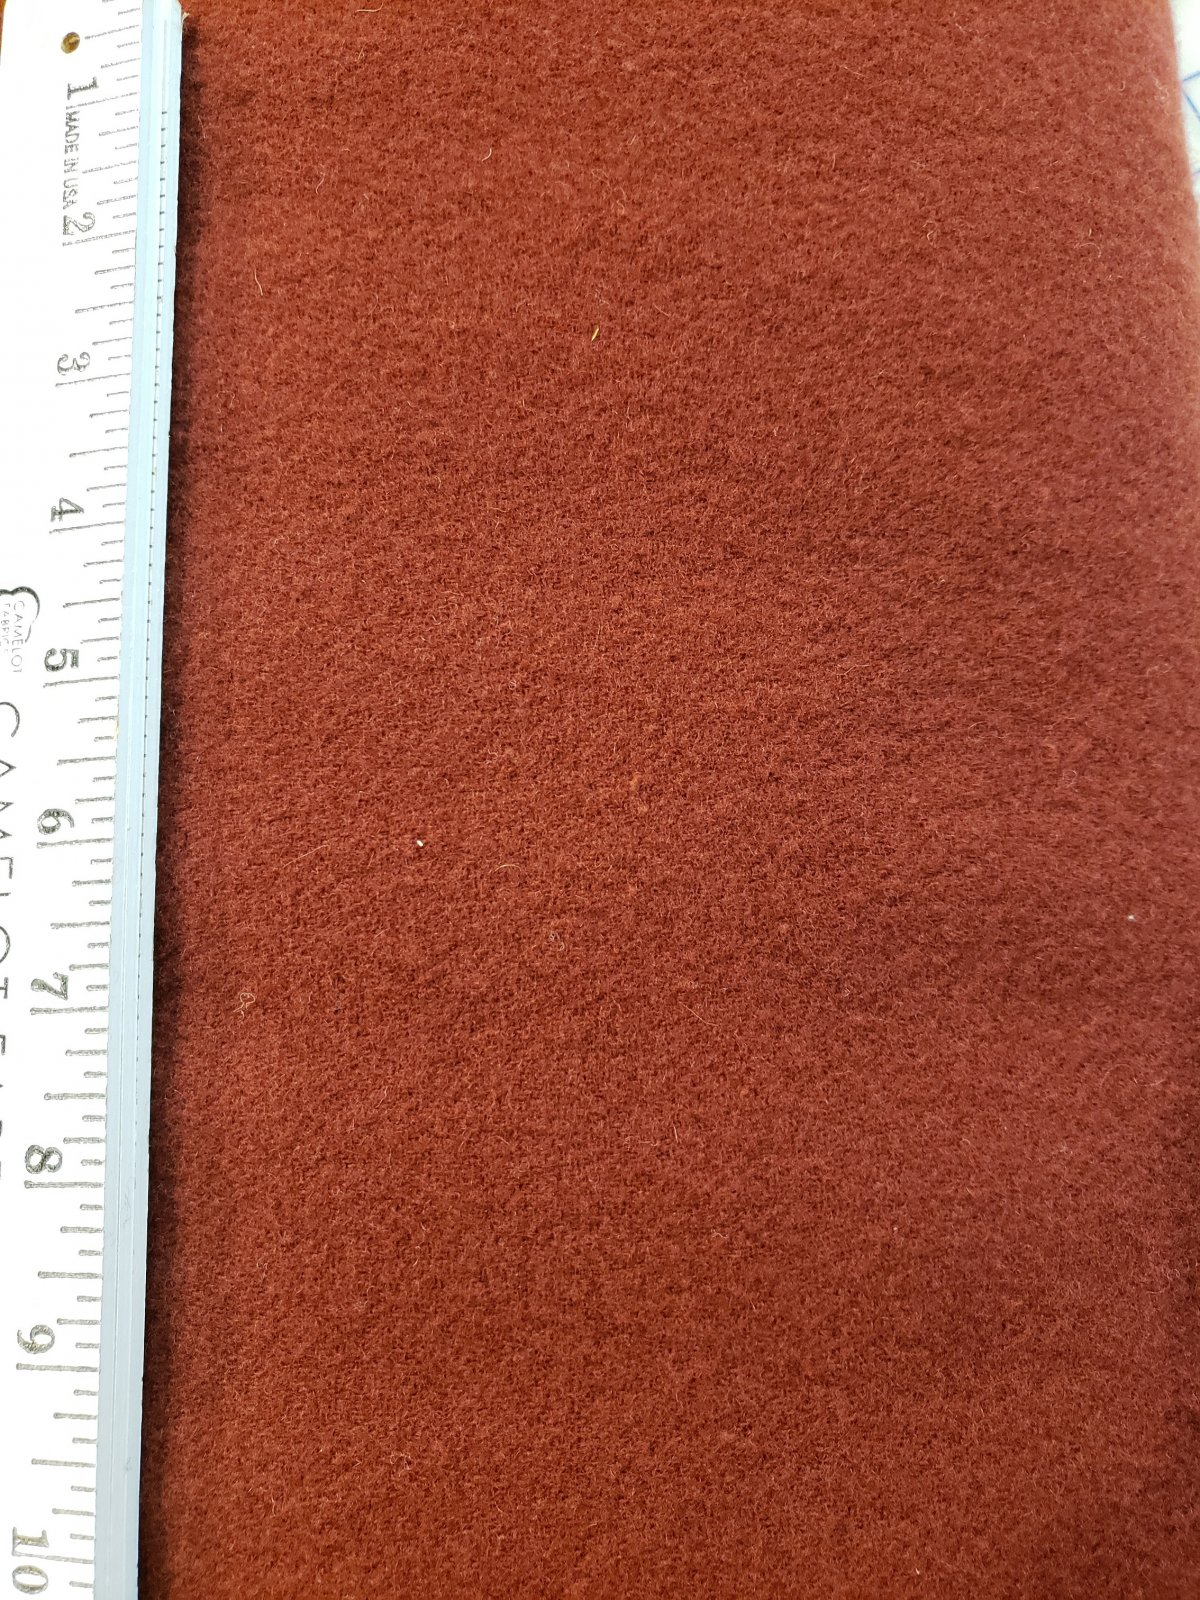 Wool - Dark Red